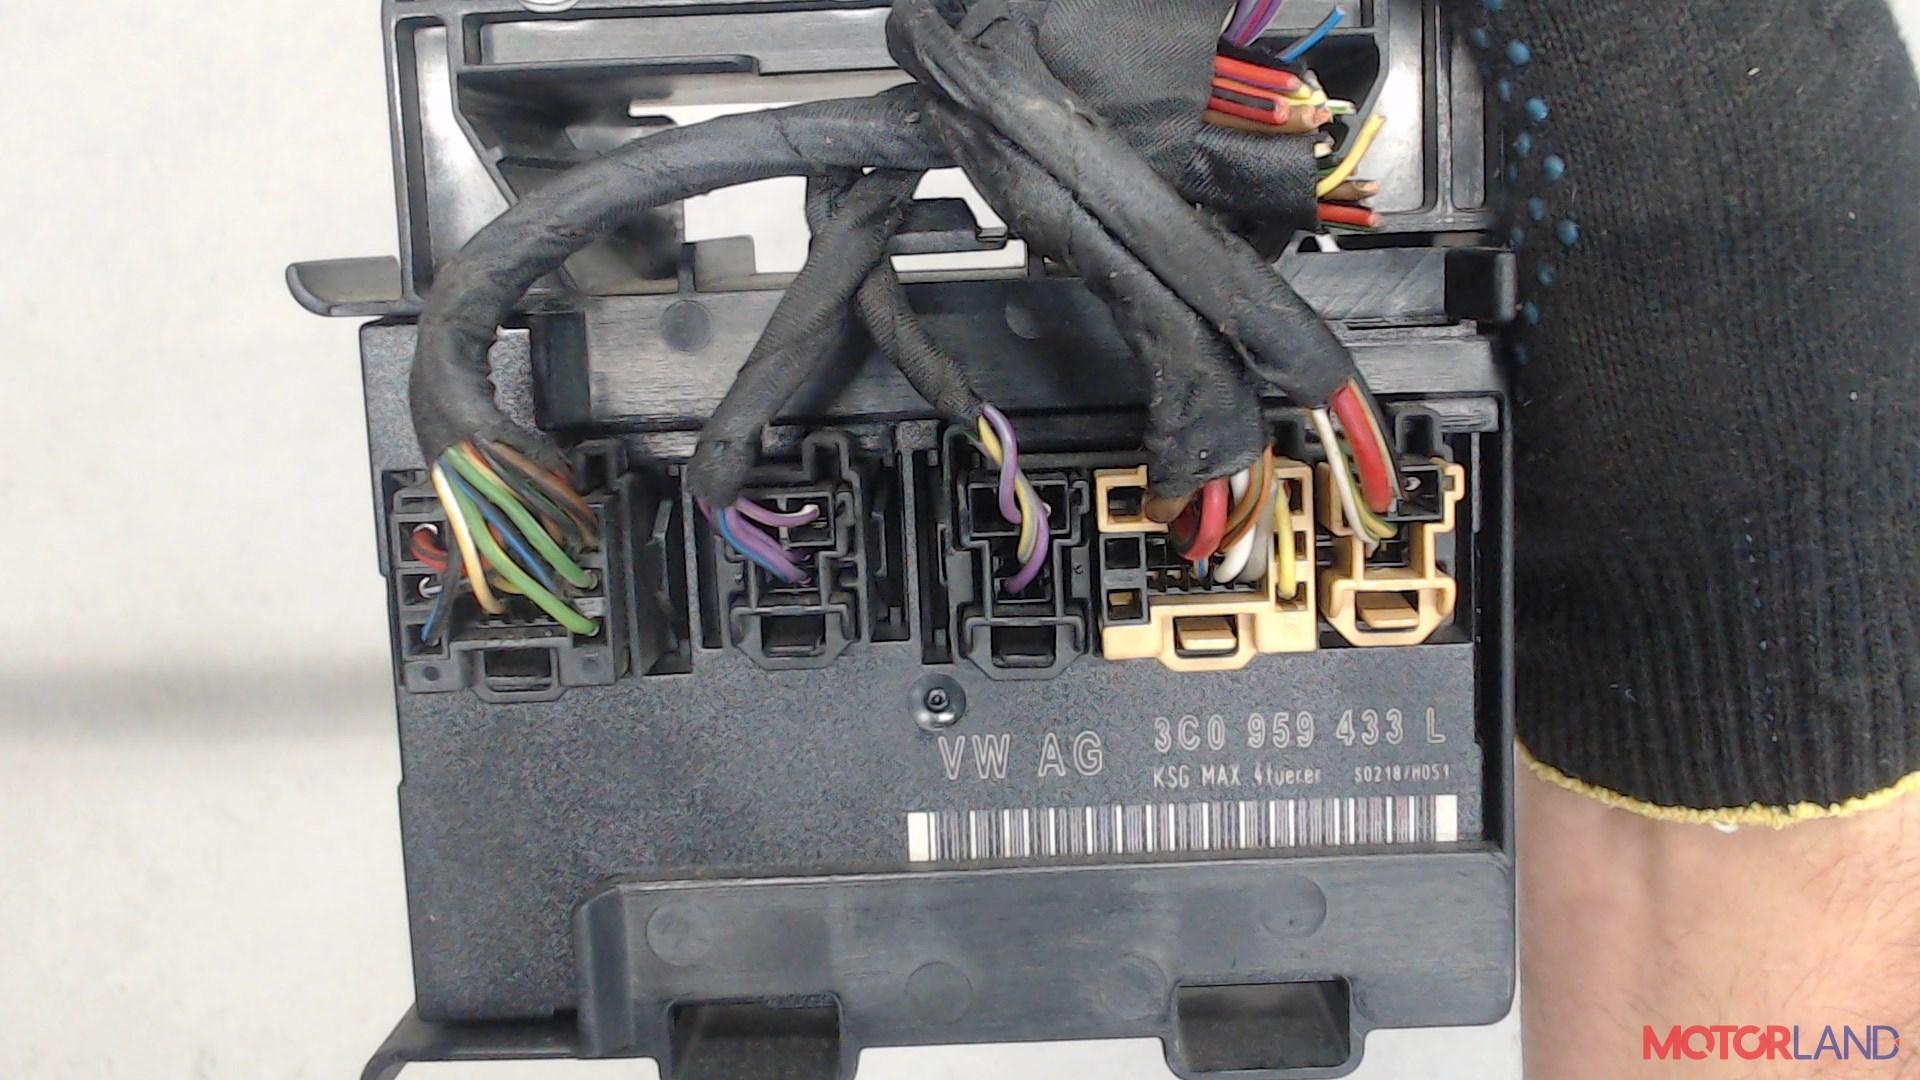 Блок управления (ЭБУ) Volkswagen Passat 6 2005-2010 3.2 л. 2006 AXZ б/у #4